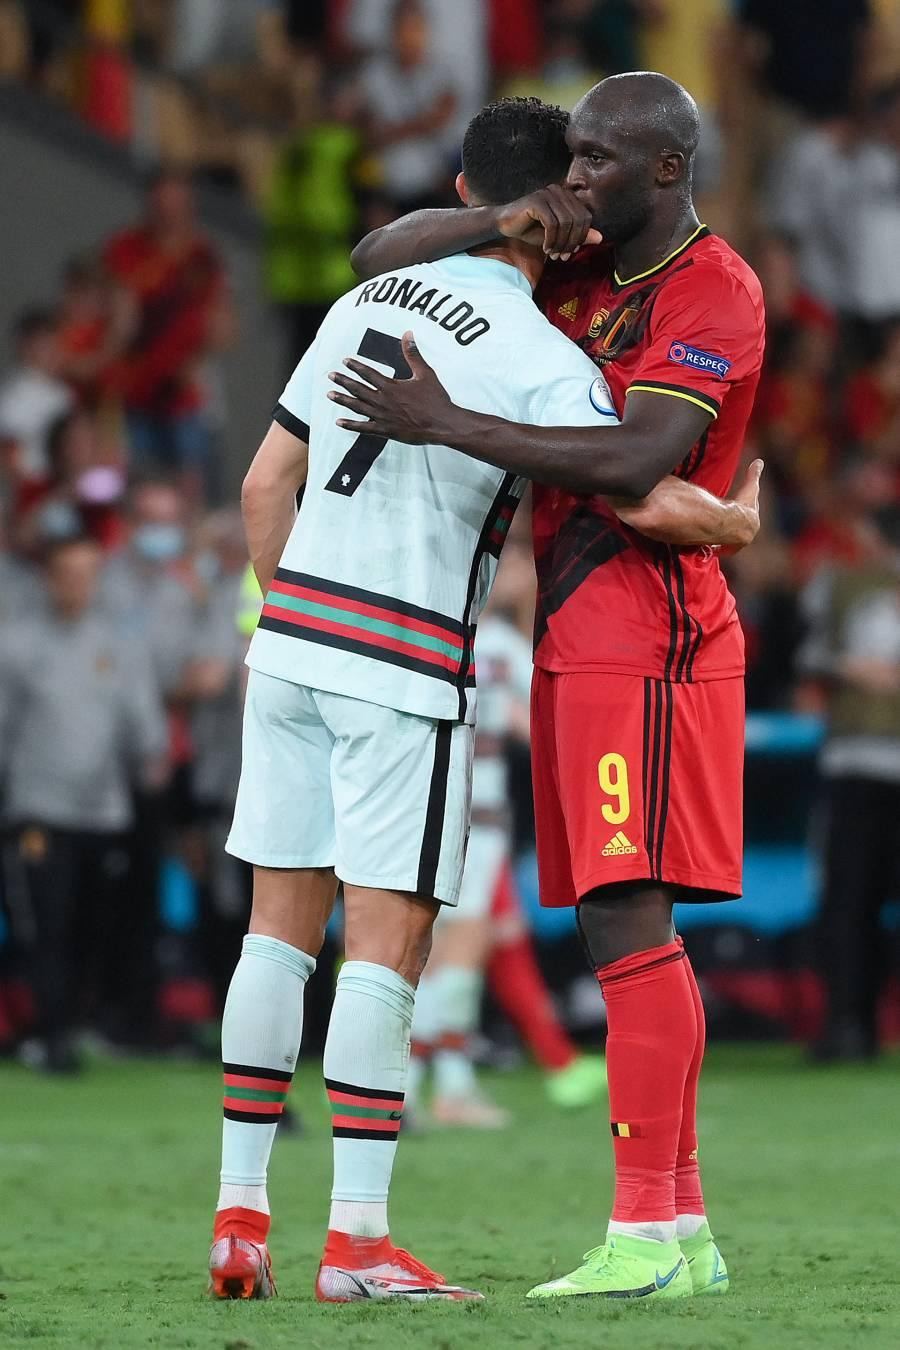 Eurocopa: ¡Adios Ronaldo! Bélgica derrota a la campeona Portugal